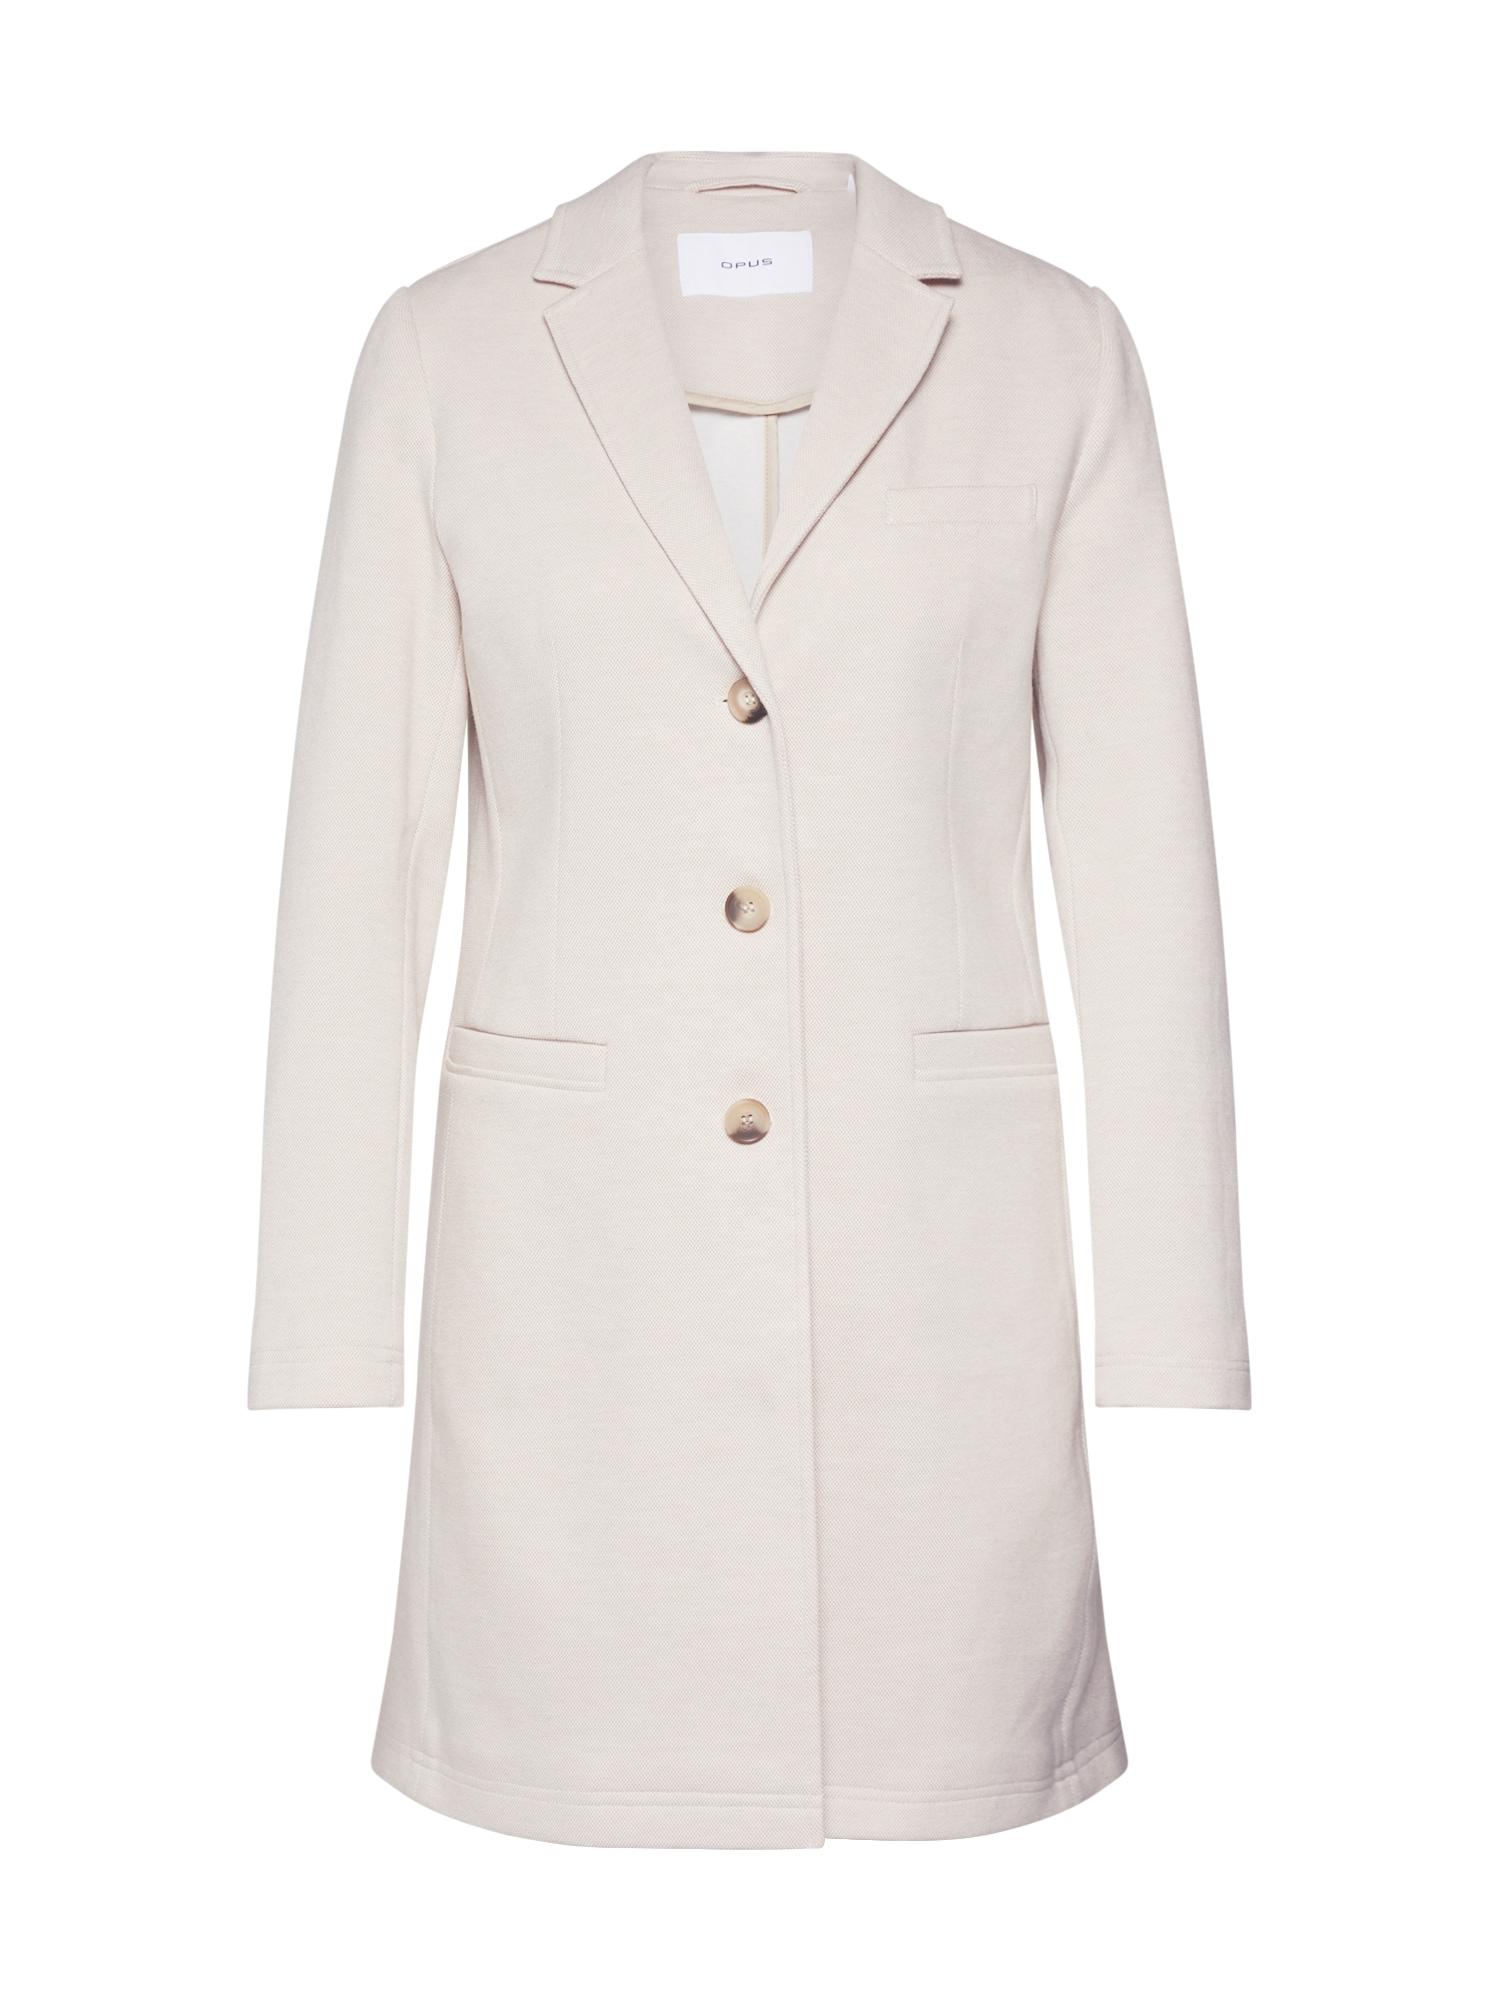 OPUS Demisezoninis paltas